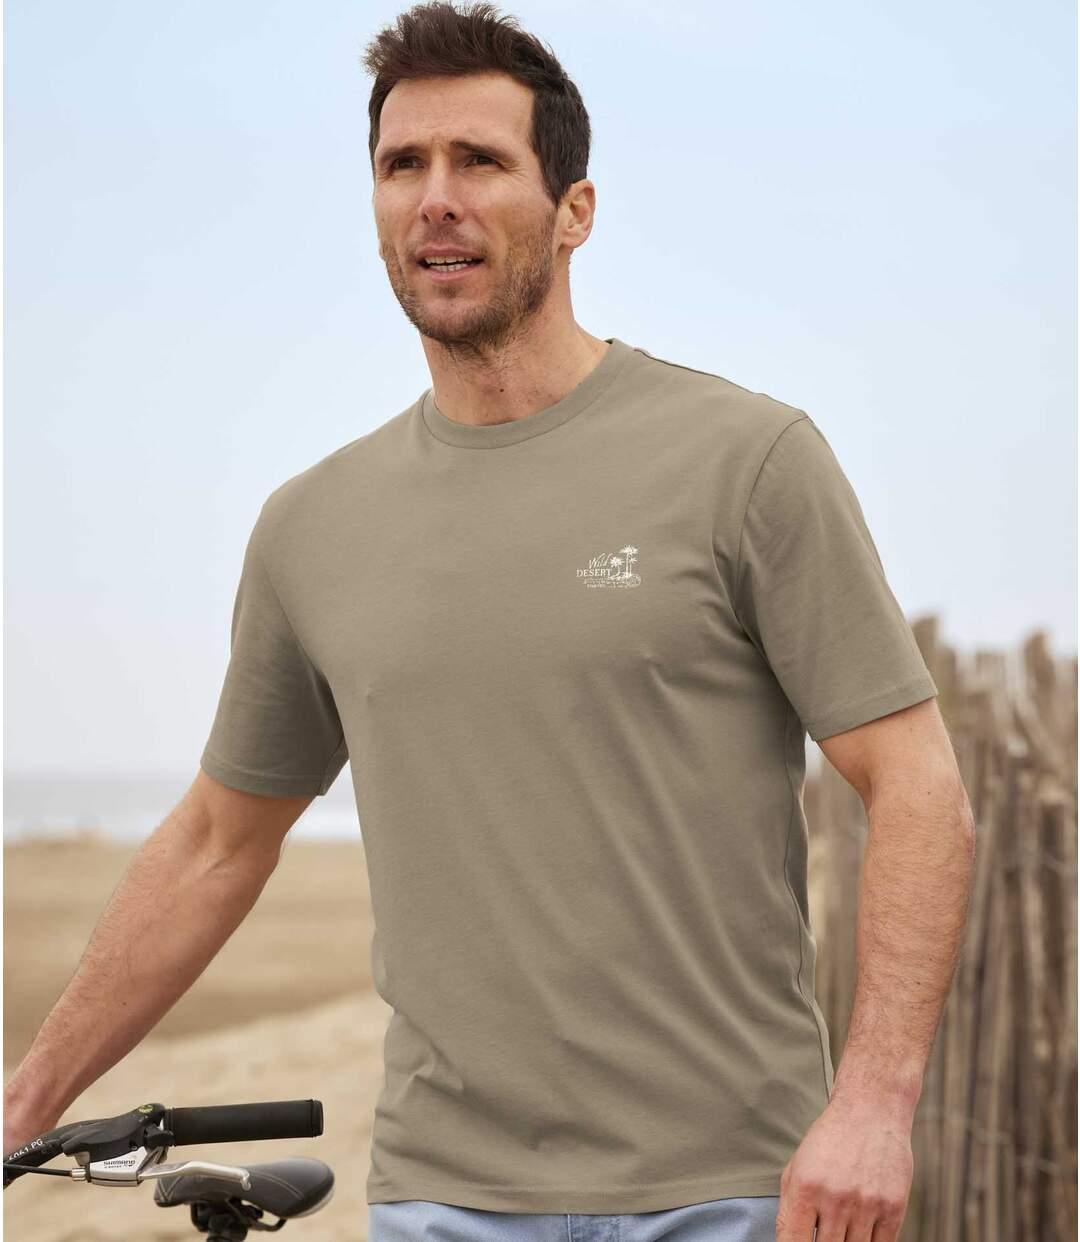 Pack of 4 Men's Classic T-Shirts - Orange Taupe Indigo Off-White Atlas For Men